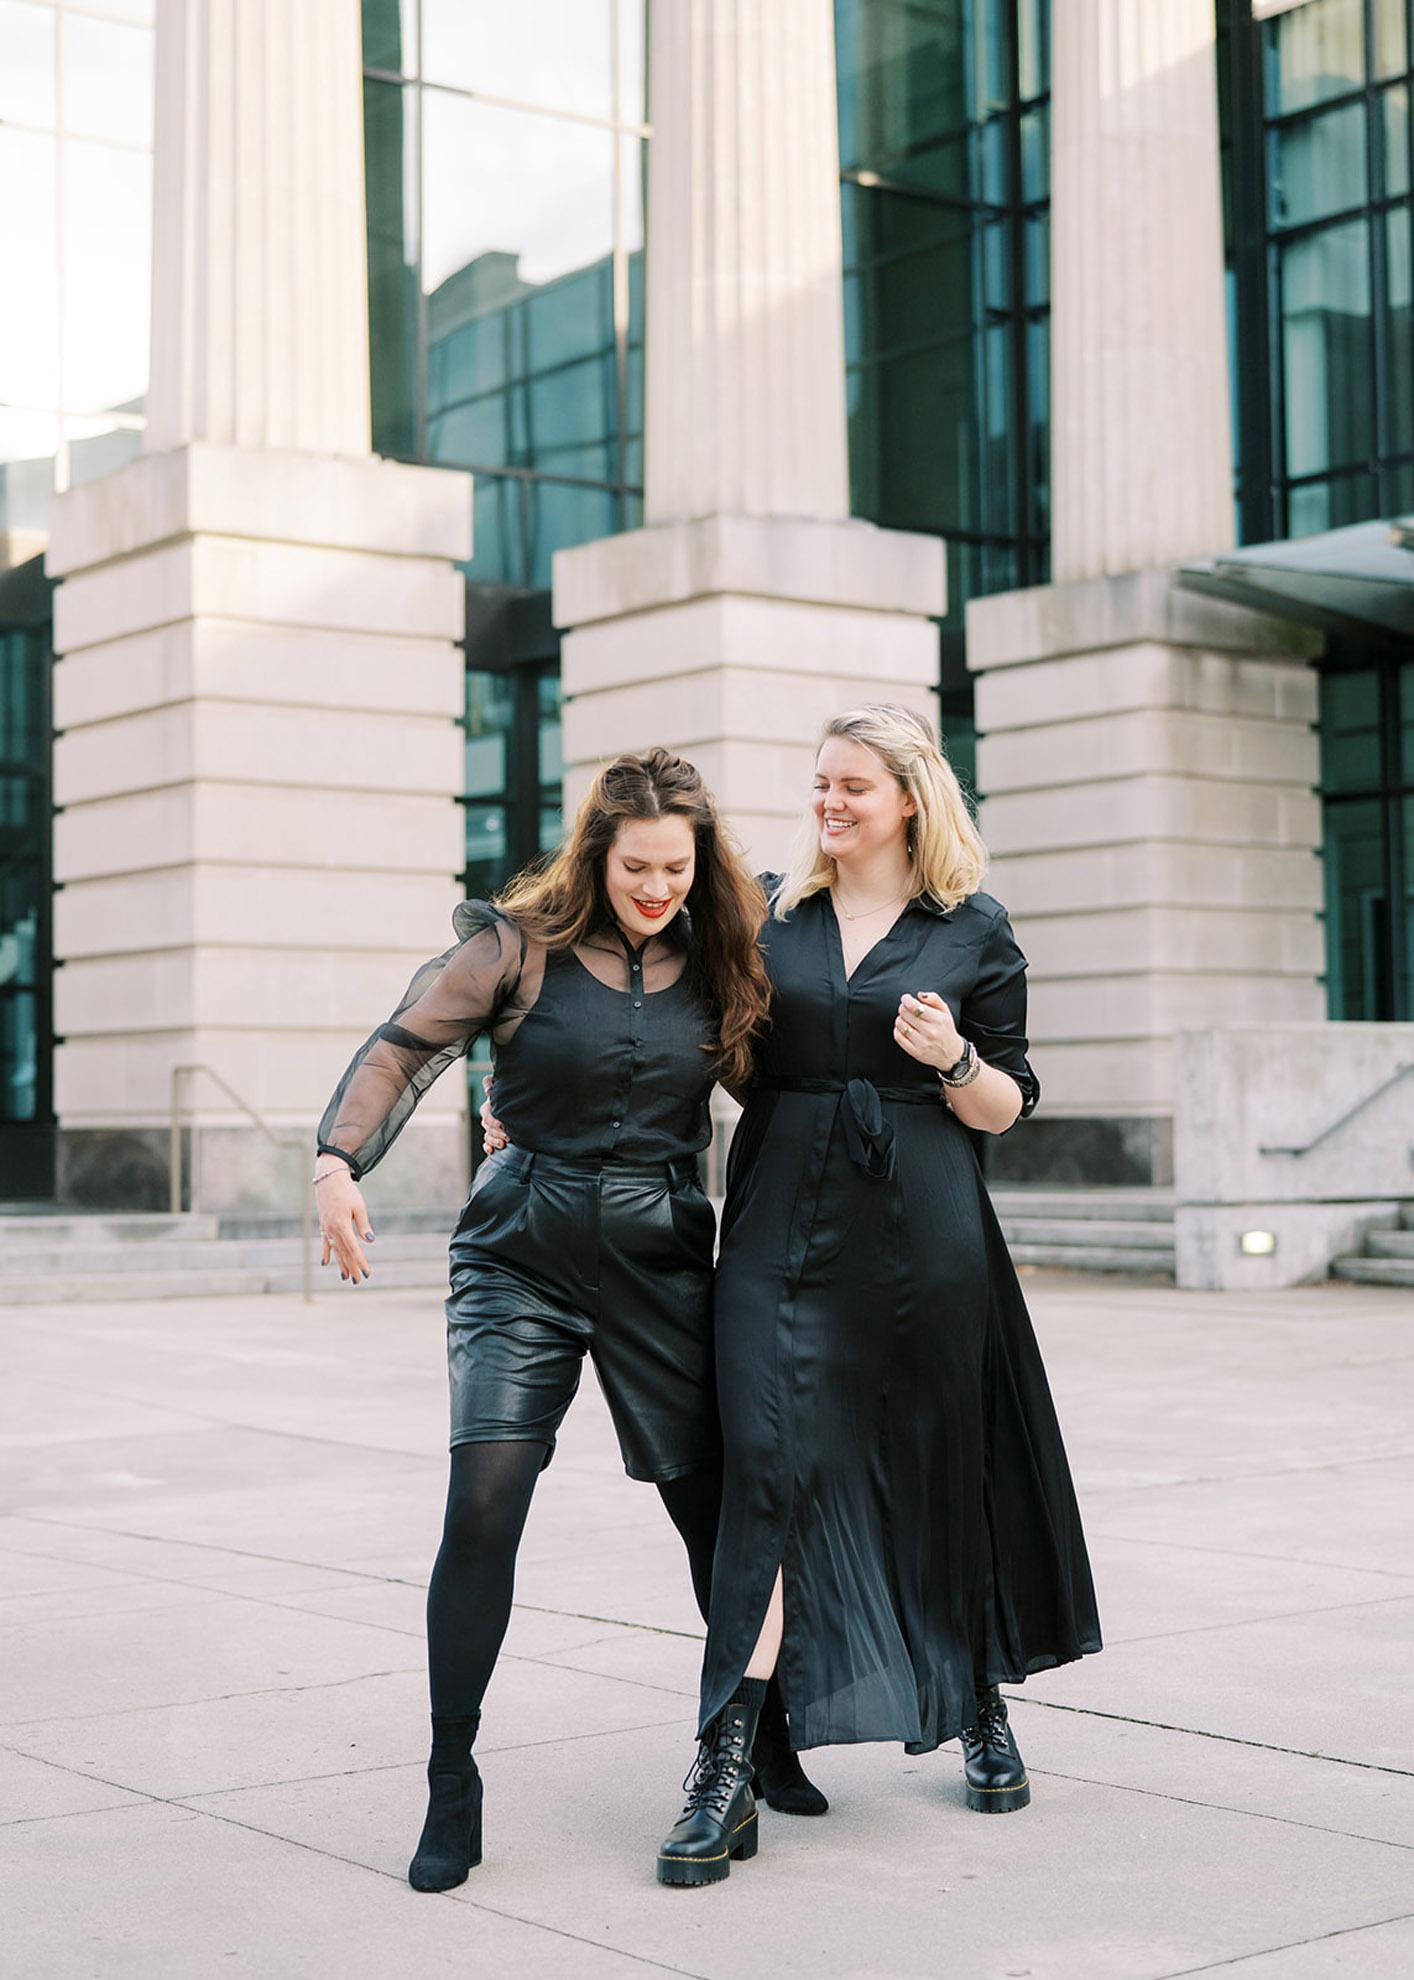 Mina Von Feilitzsch Raleigh South Carolina USA lesbian lgbtq+ musical proposal engagement Dancing With Her